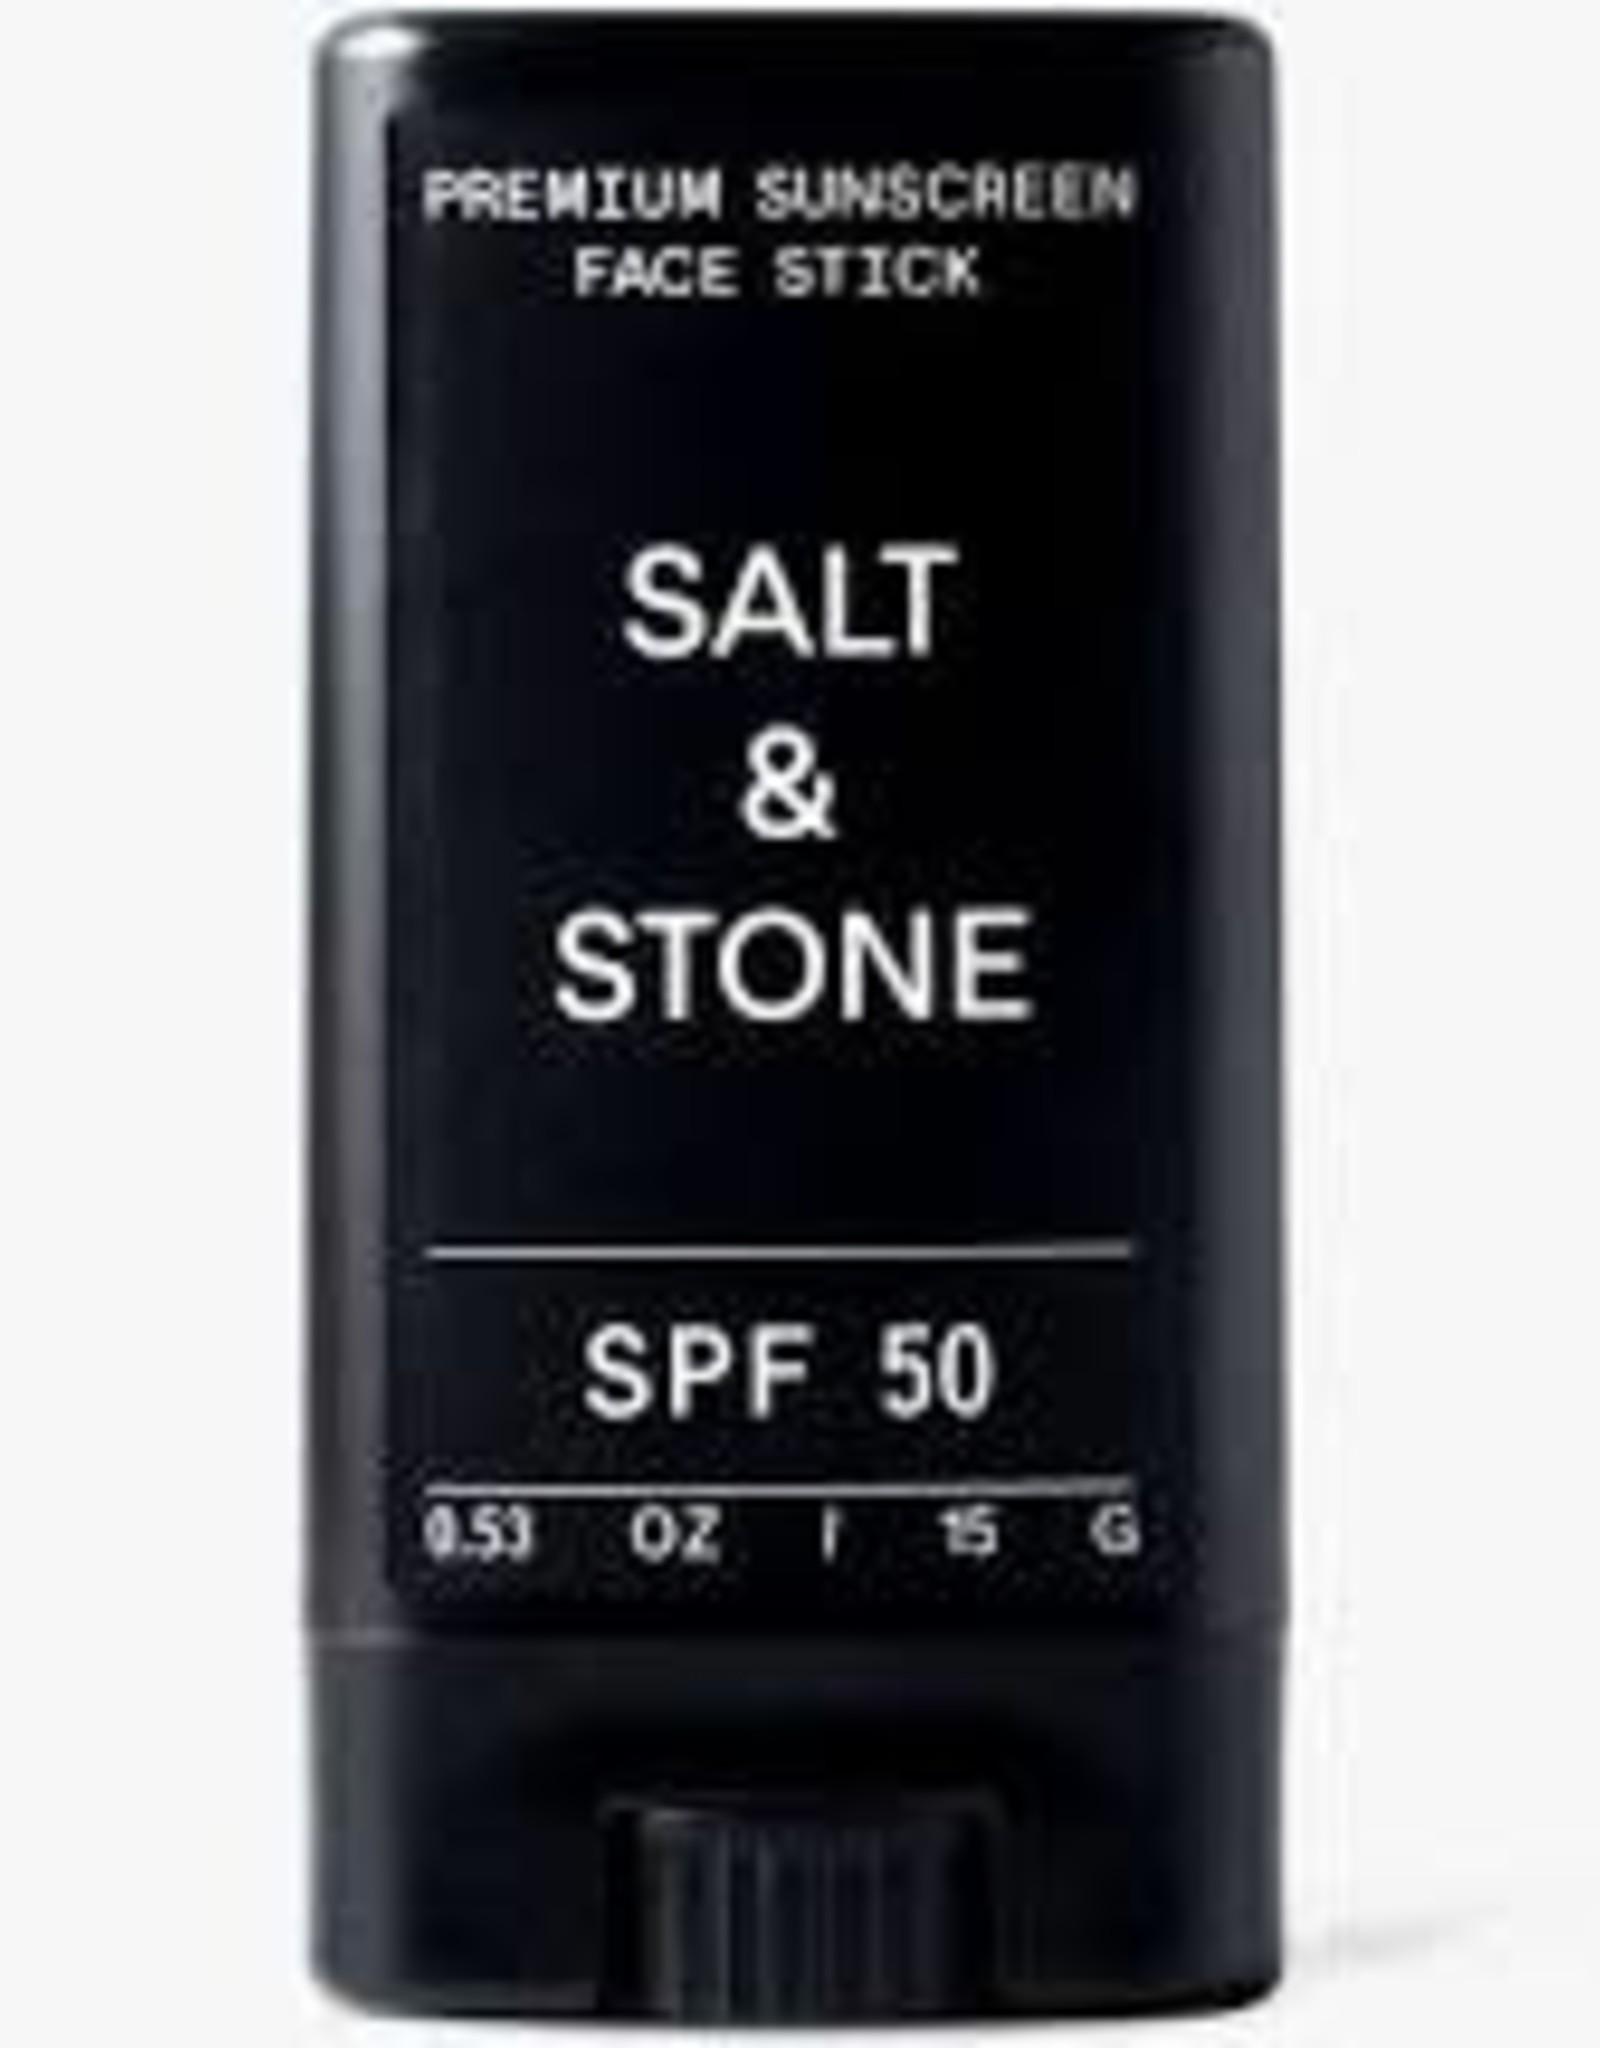 salt and stone salt and stone spf 50 facestick